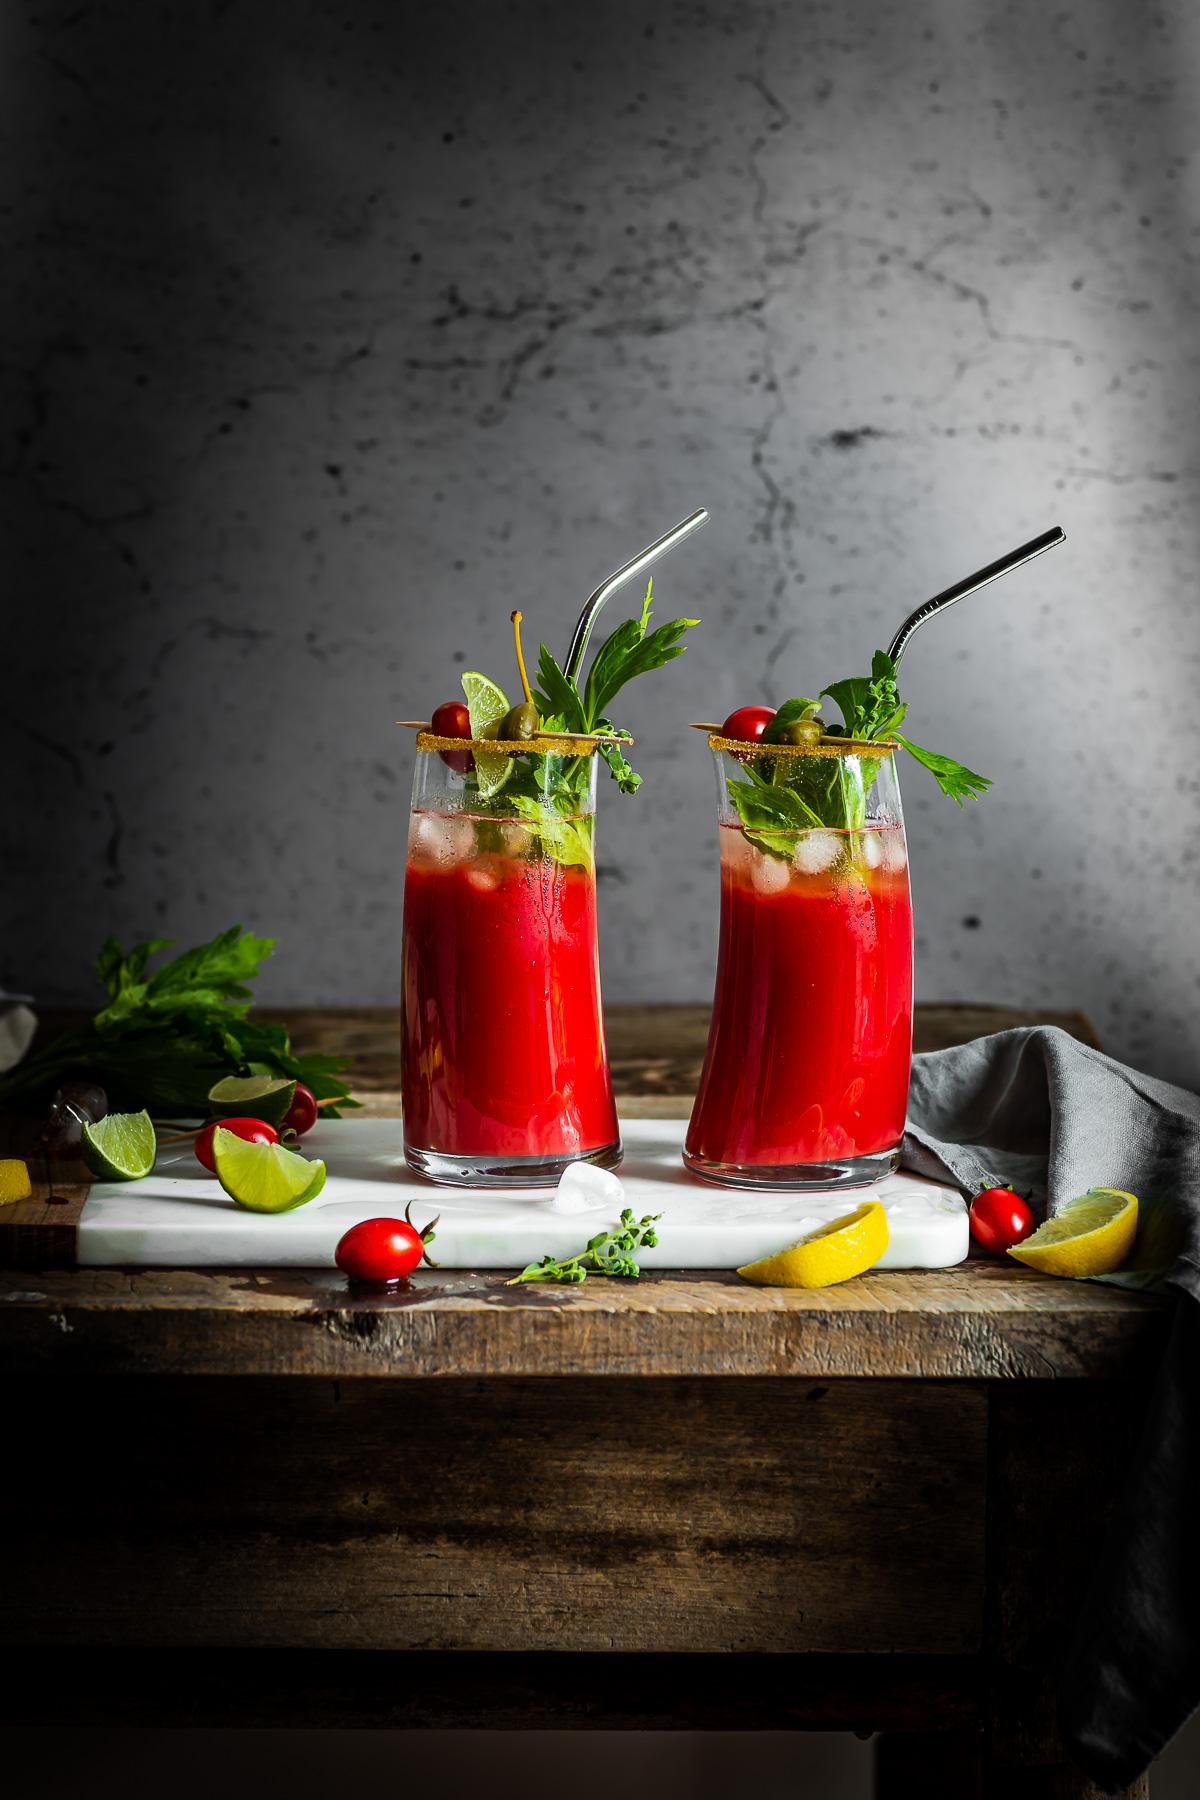 healthy Vegan Water Kefir non alcoholic Bloody Mary recipe #cocktail ricetta Bloody Mary Analcolico al Kefir d acqua per brunch e festa sano rinfrescante succo di pomodoro